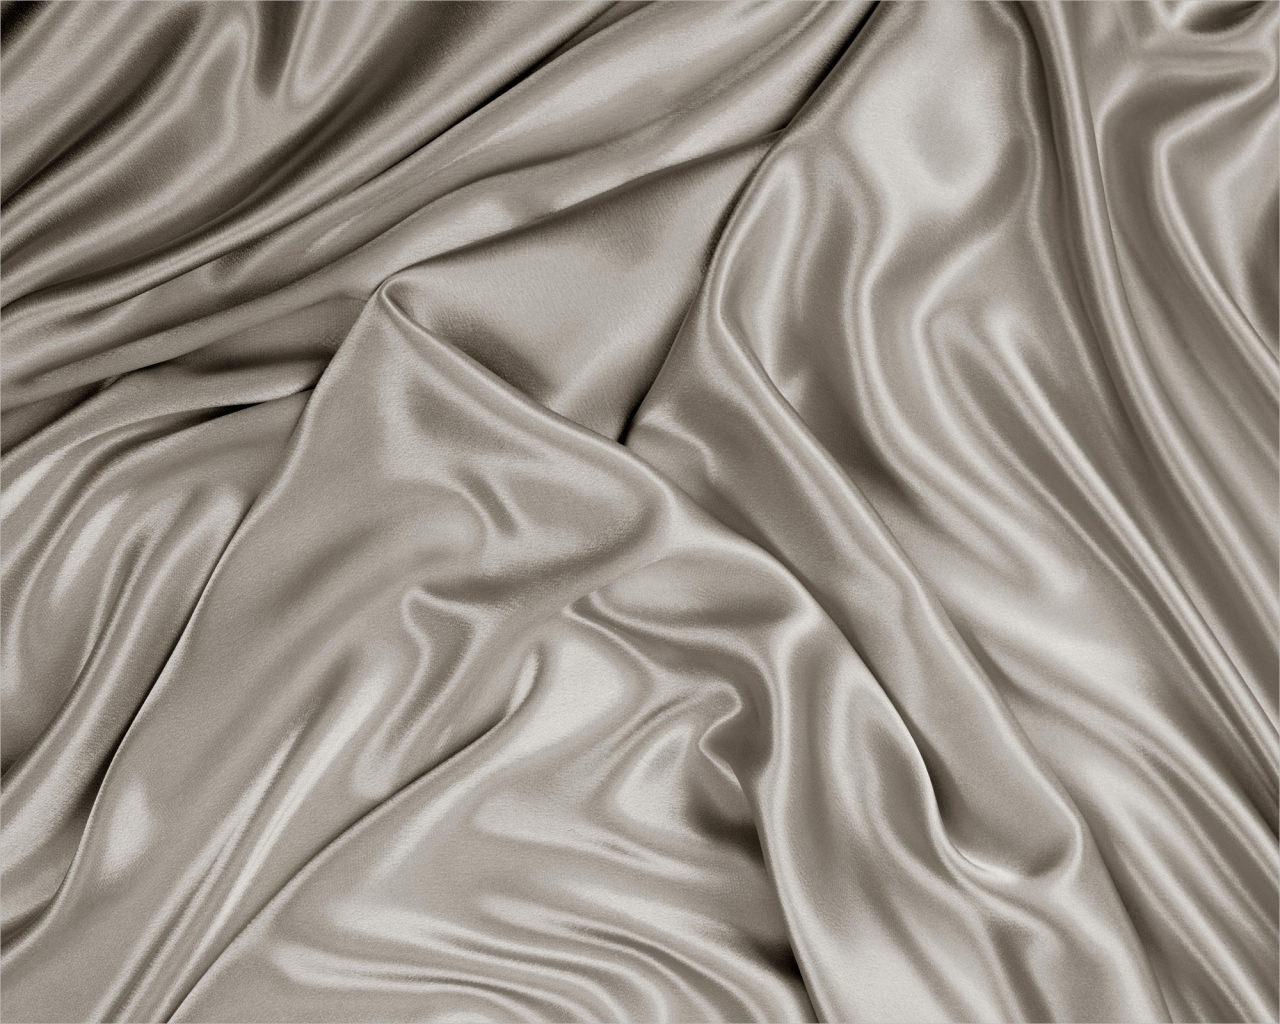 Free Gray Silk Fabric Texture